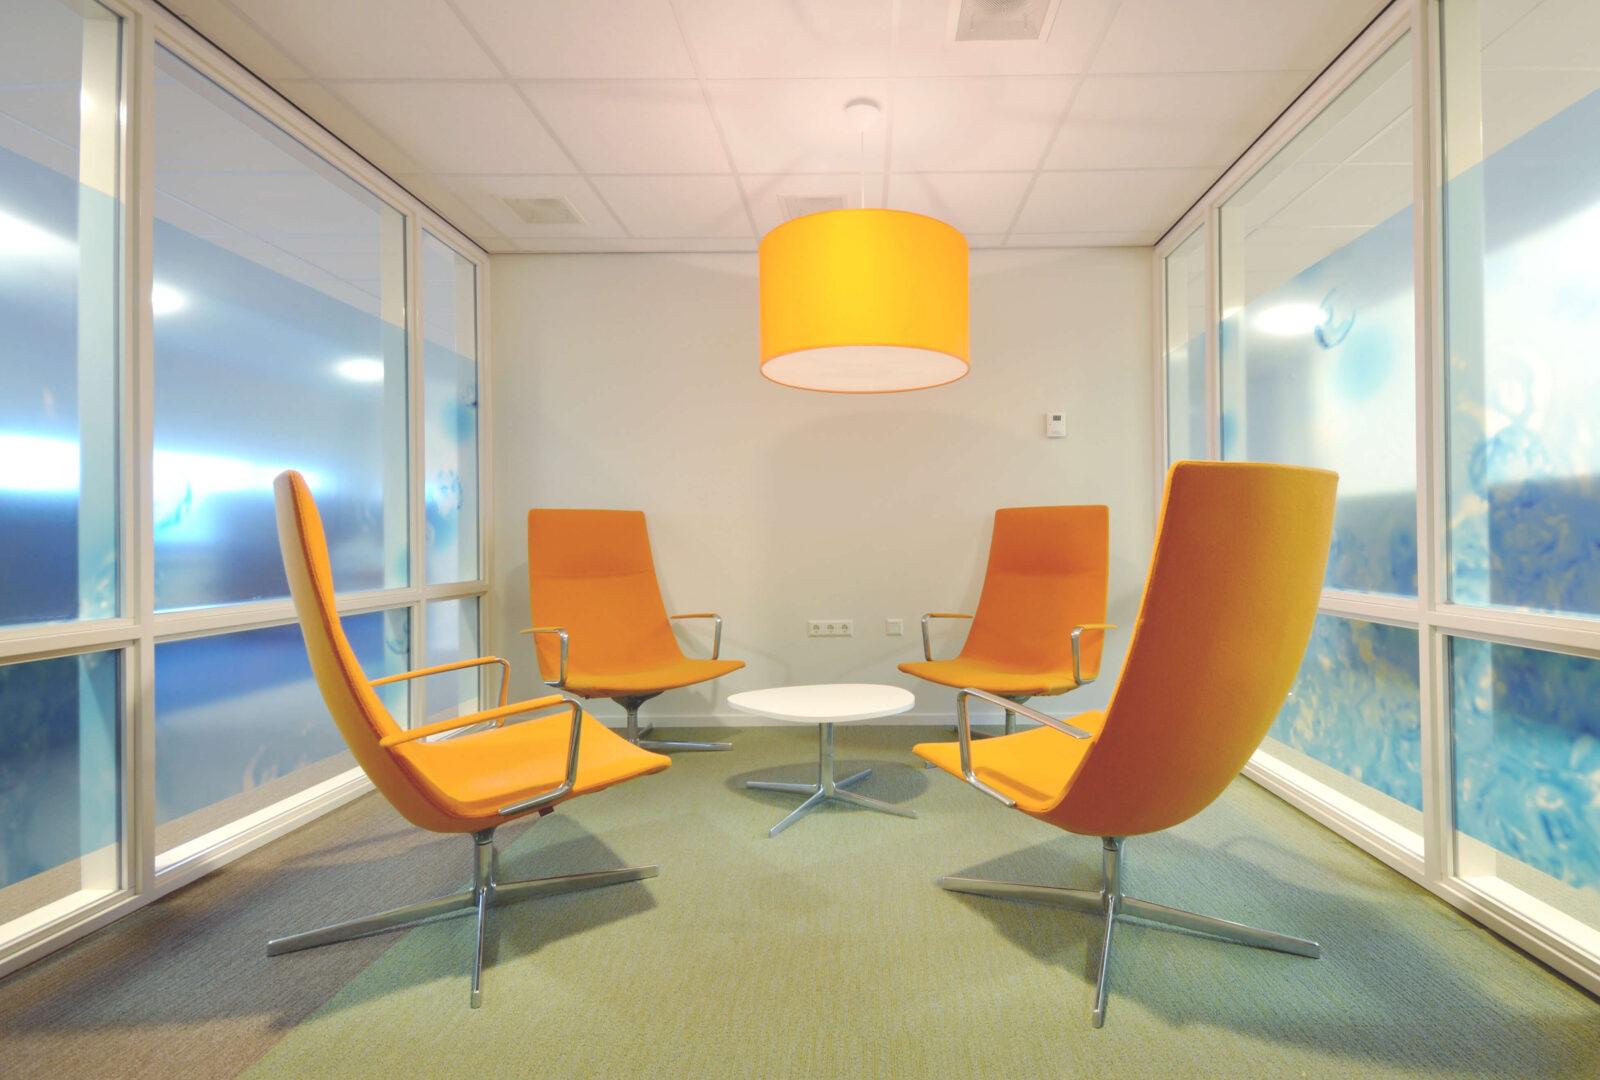 GGZ-centrum-Autisme-Kristal-Zijlstra-Schipper-Architecten-informeel-overleg-01 -LR